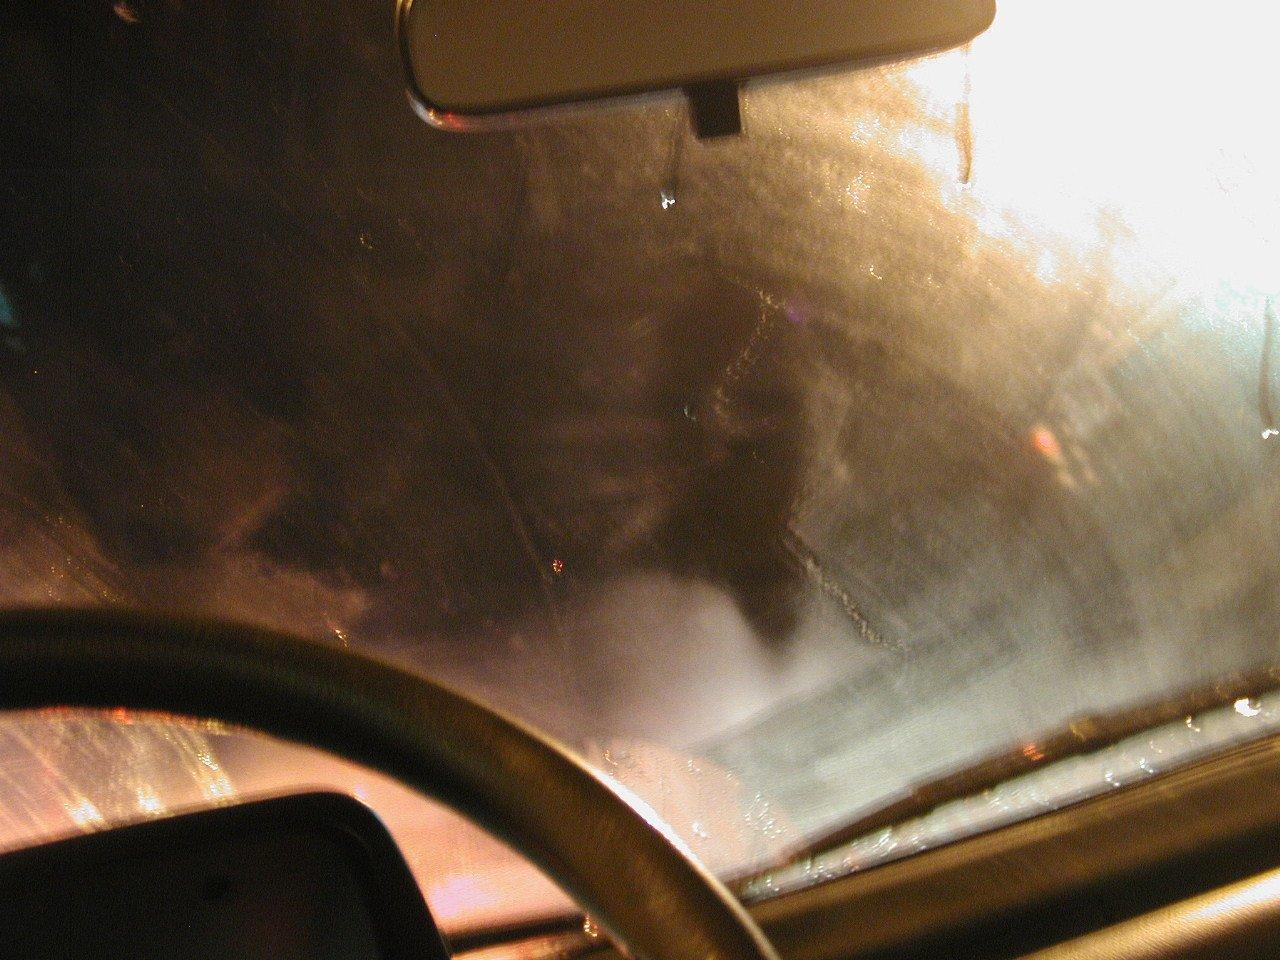 Car steering wheel in the rain